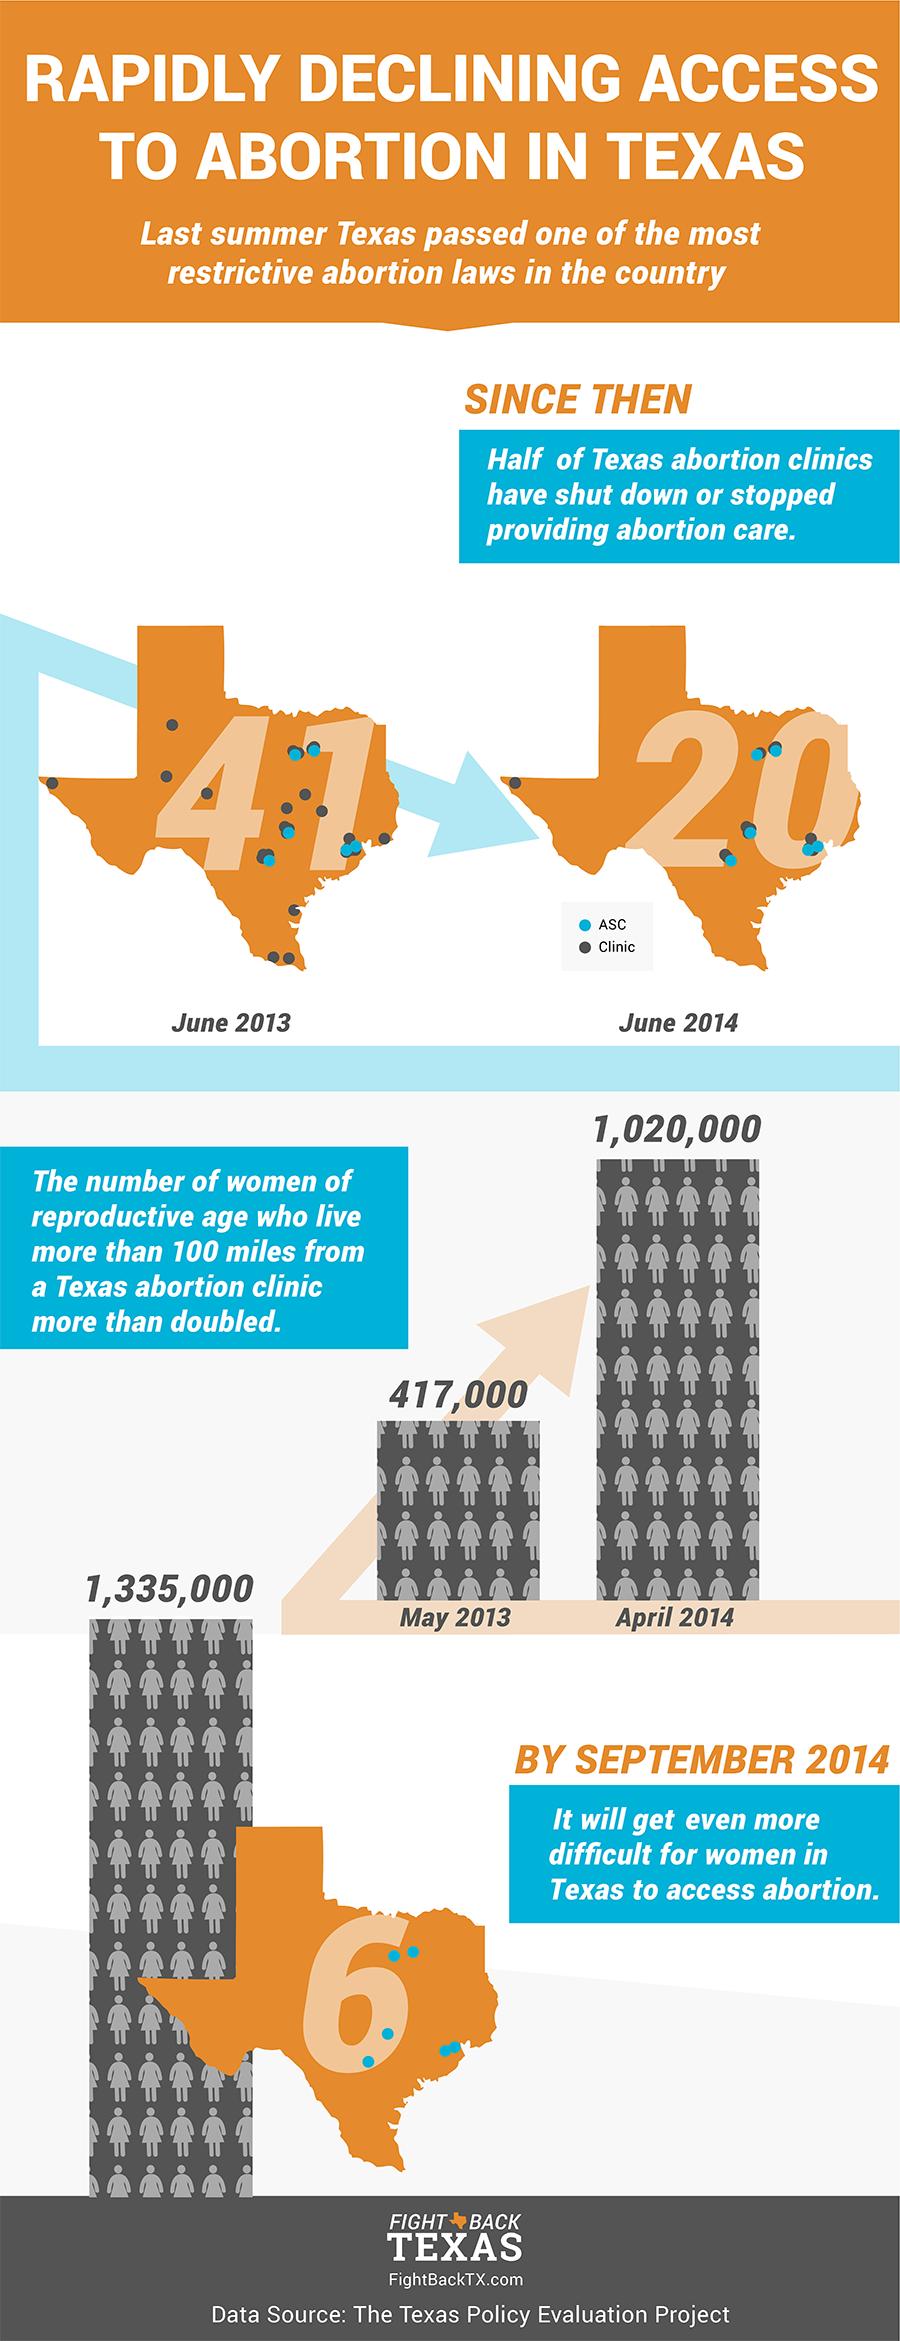 Abortion Closures Infographic